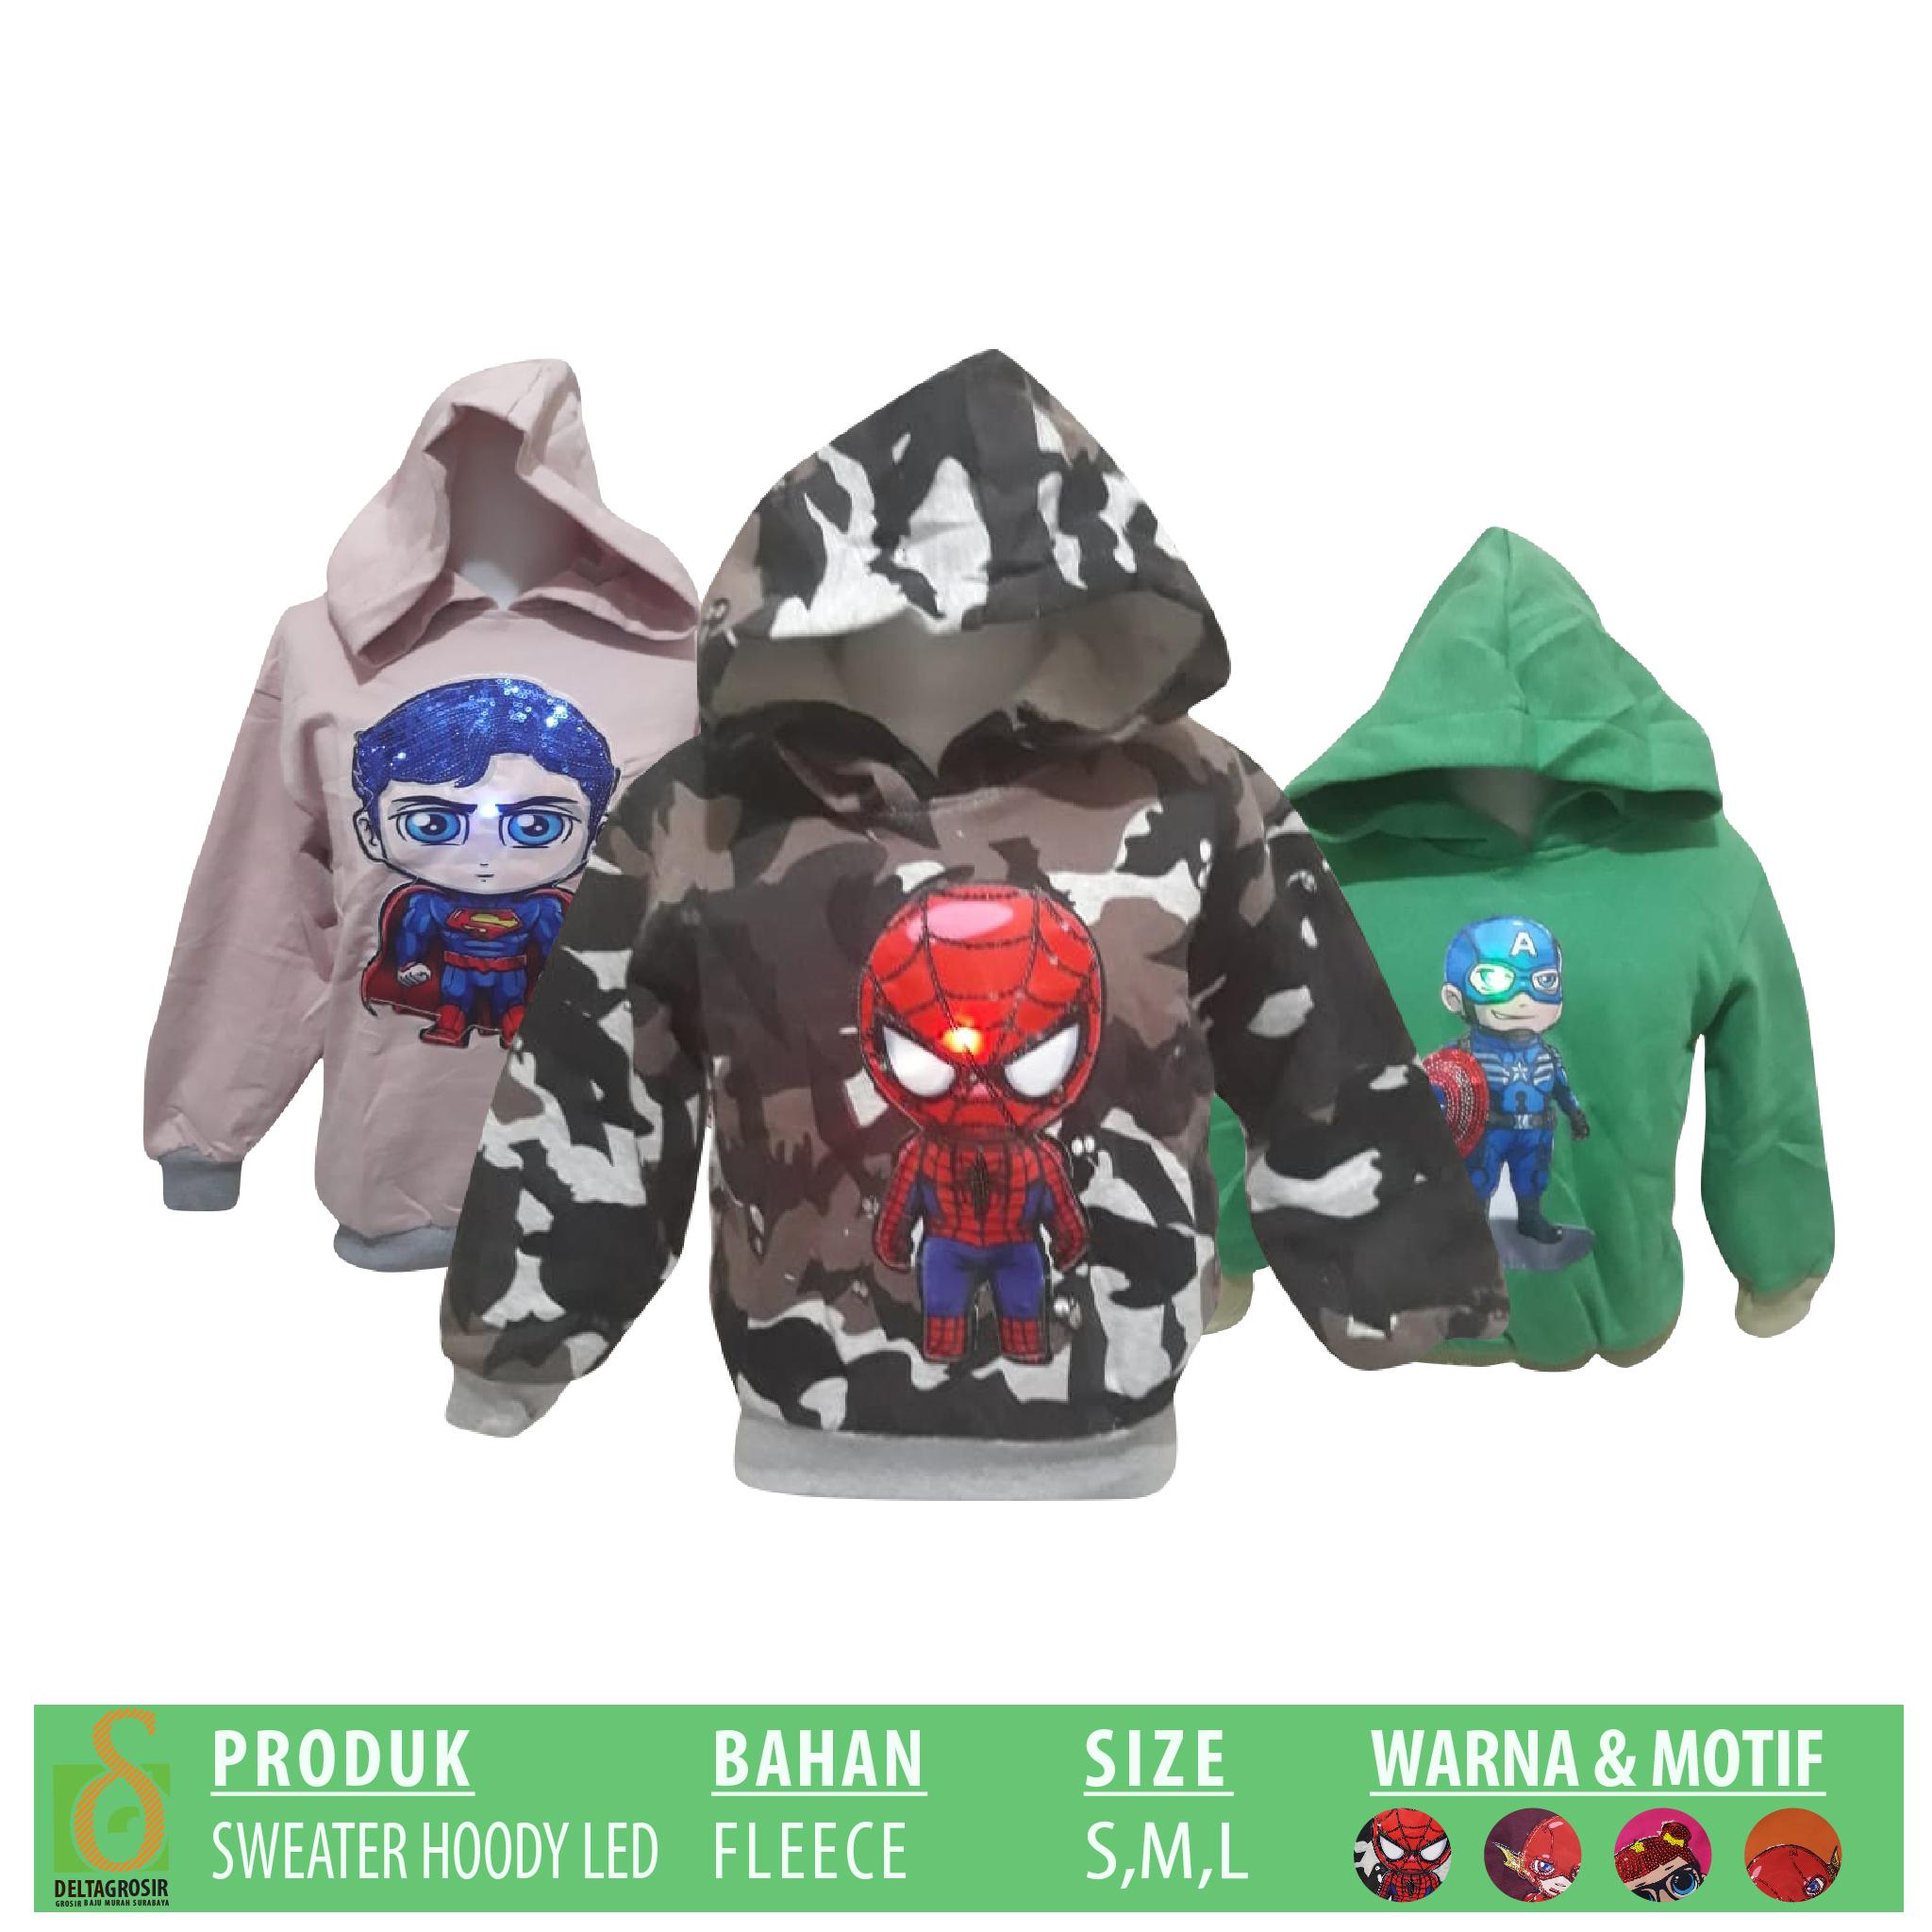 Supplier Sweater Hoody LED Anak Murah 31ribuan